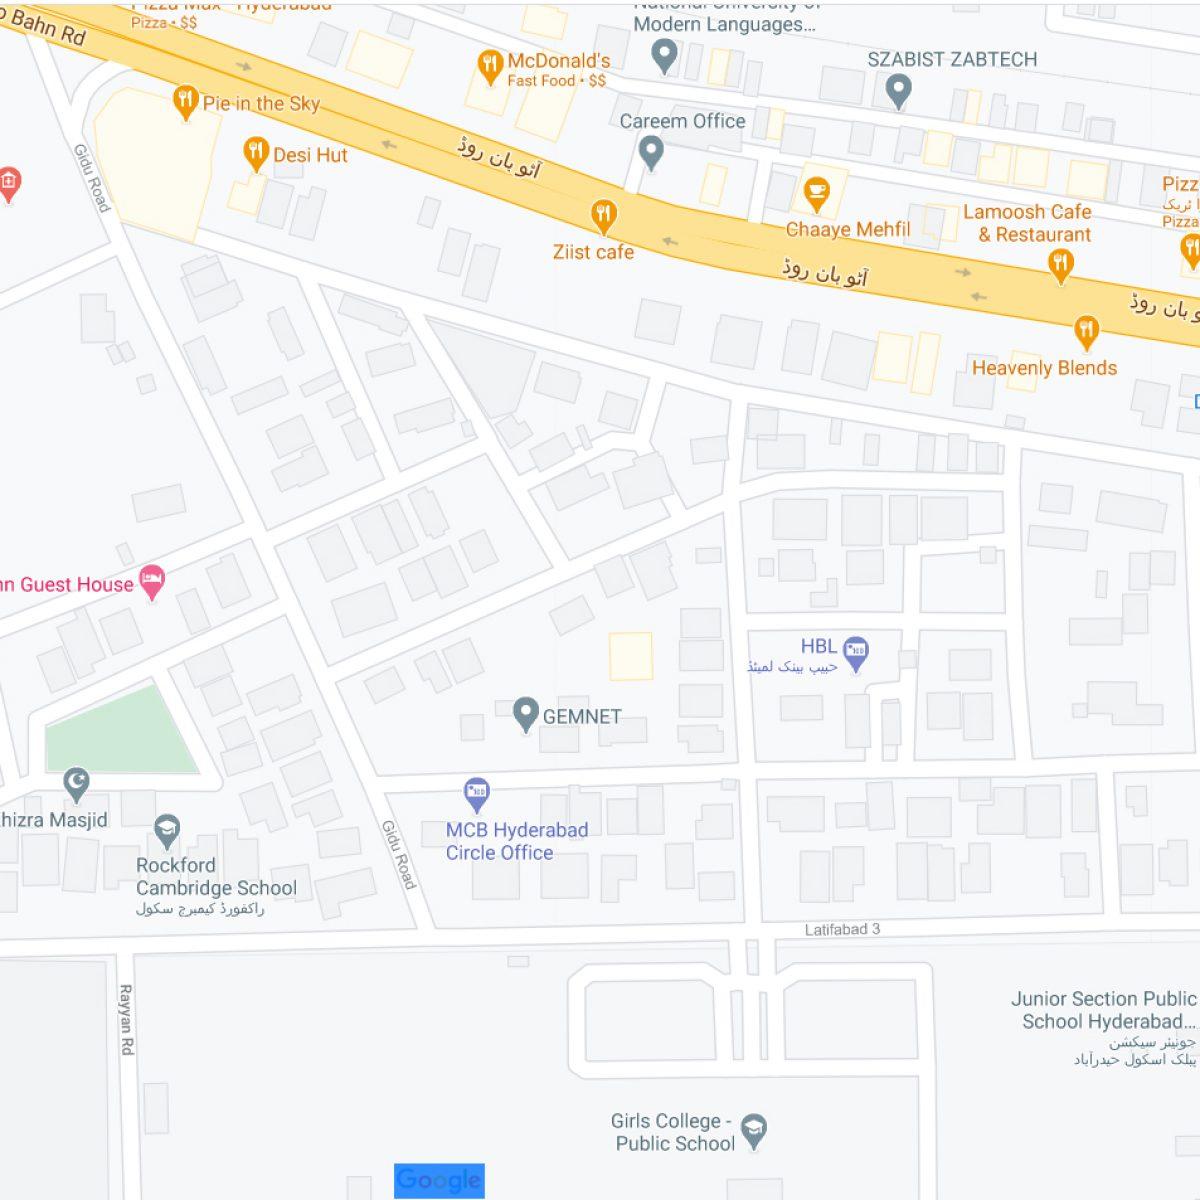 https://www.ges.net.pk/wp-content/uploads/2021/02/Gemnet-Map-1200x1200.jpg